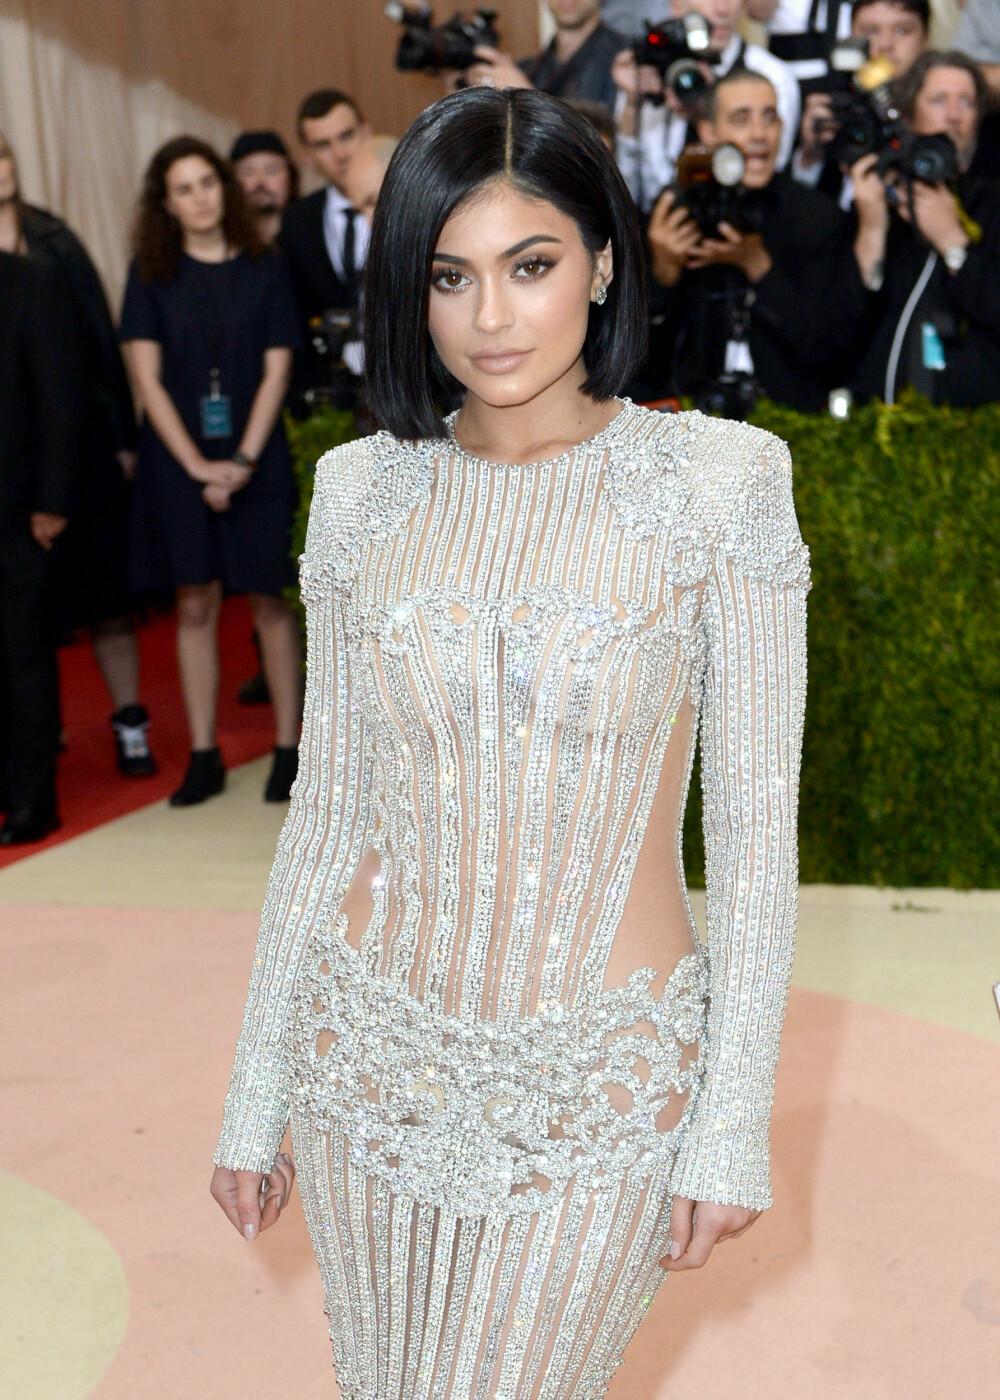 PÅ BALL: Kylie Jenner på Met Gala tidligere i år.